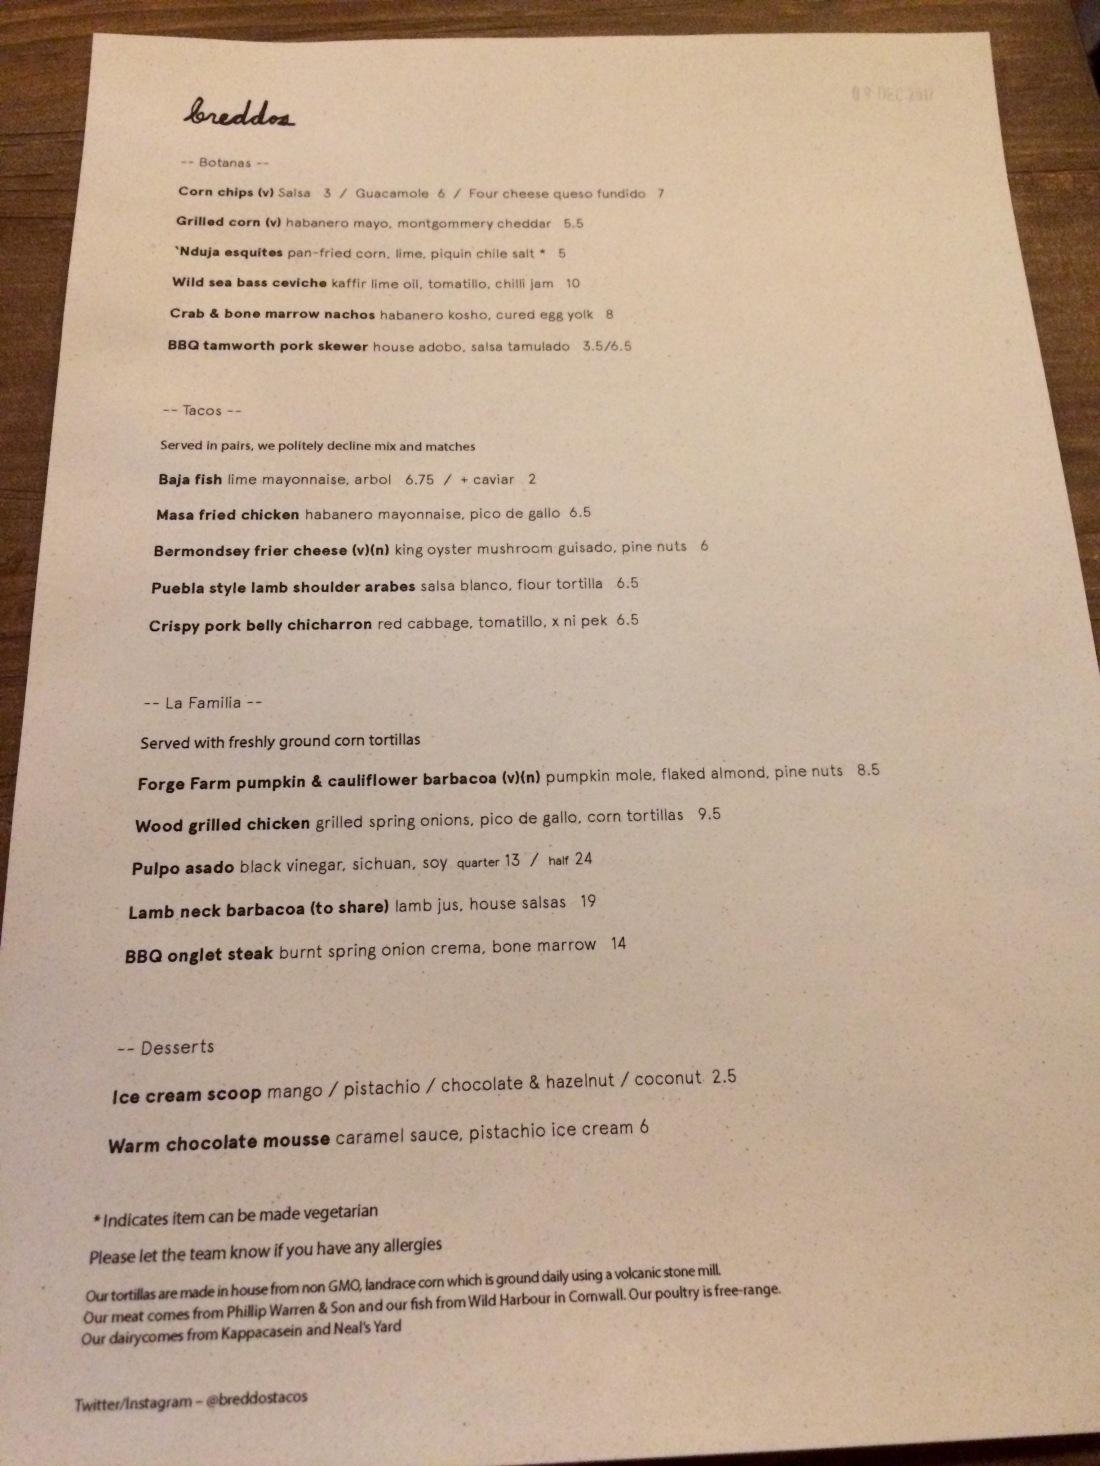 breddos-menu